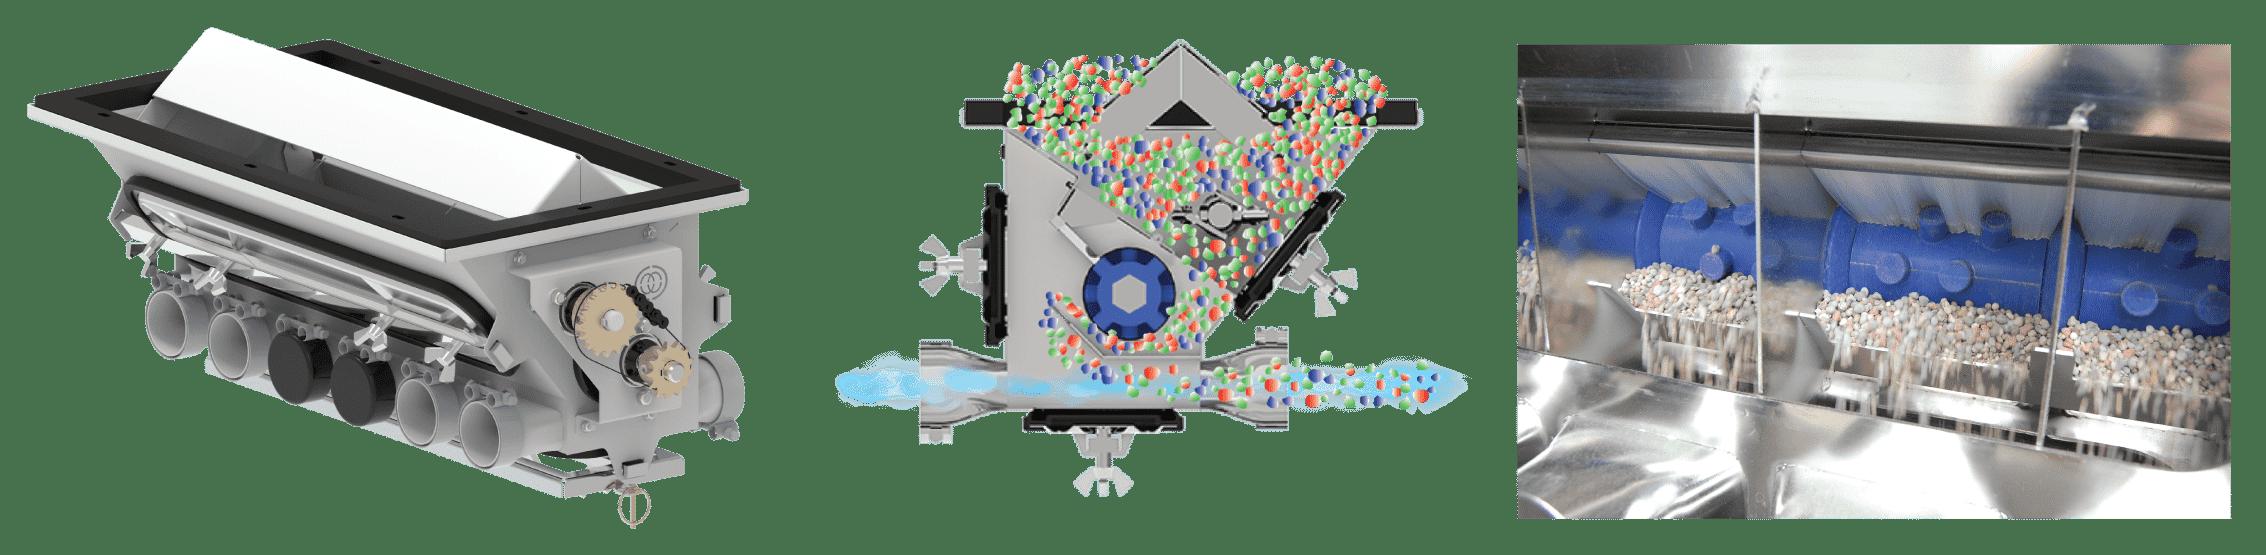 Air distribution technology